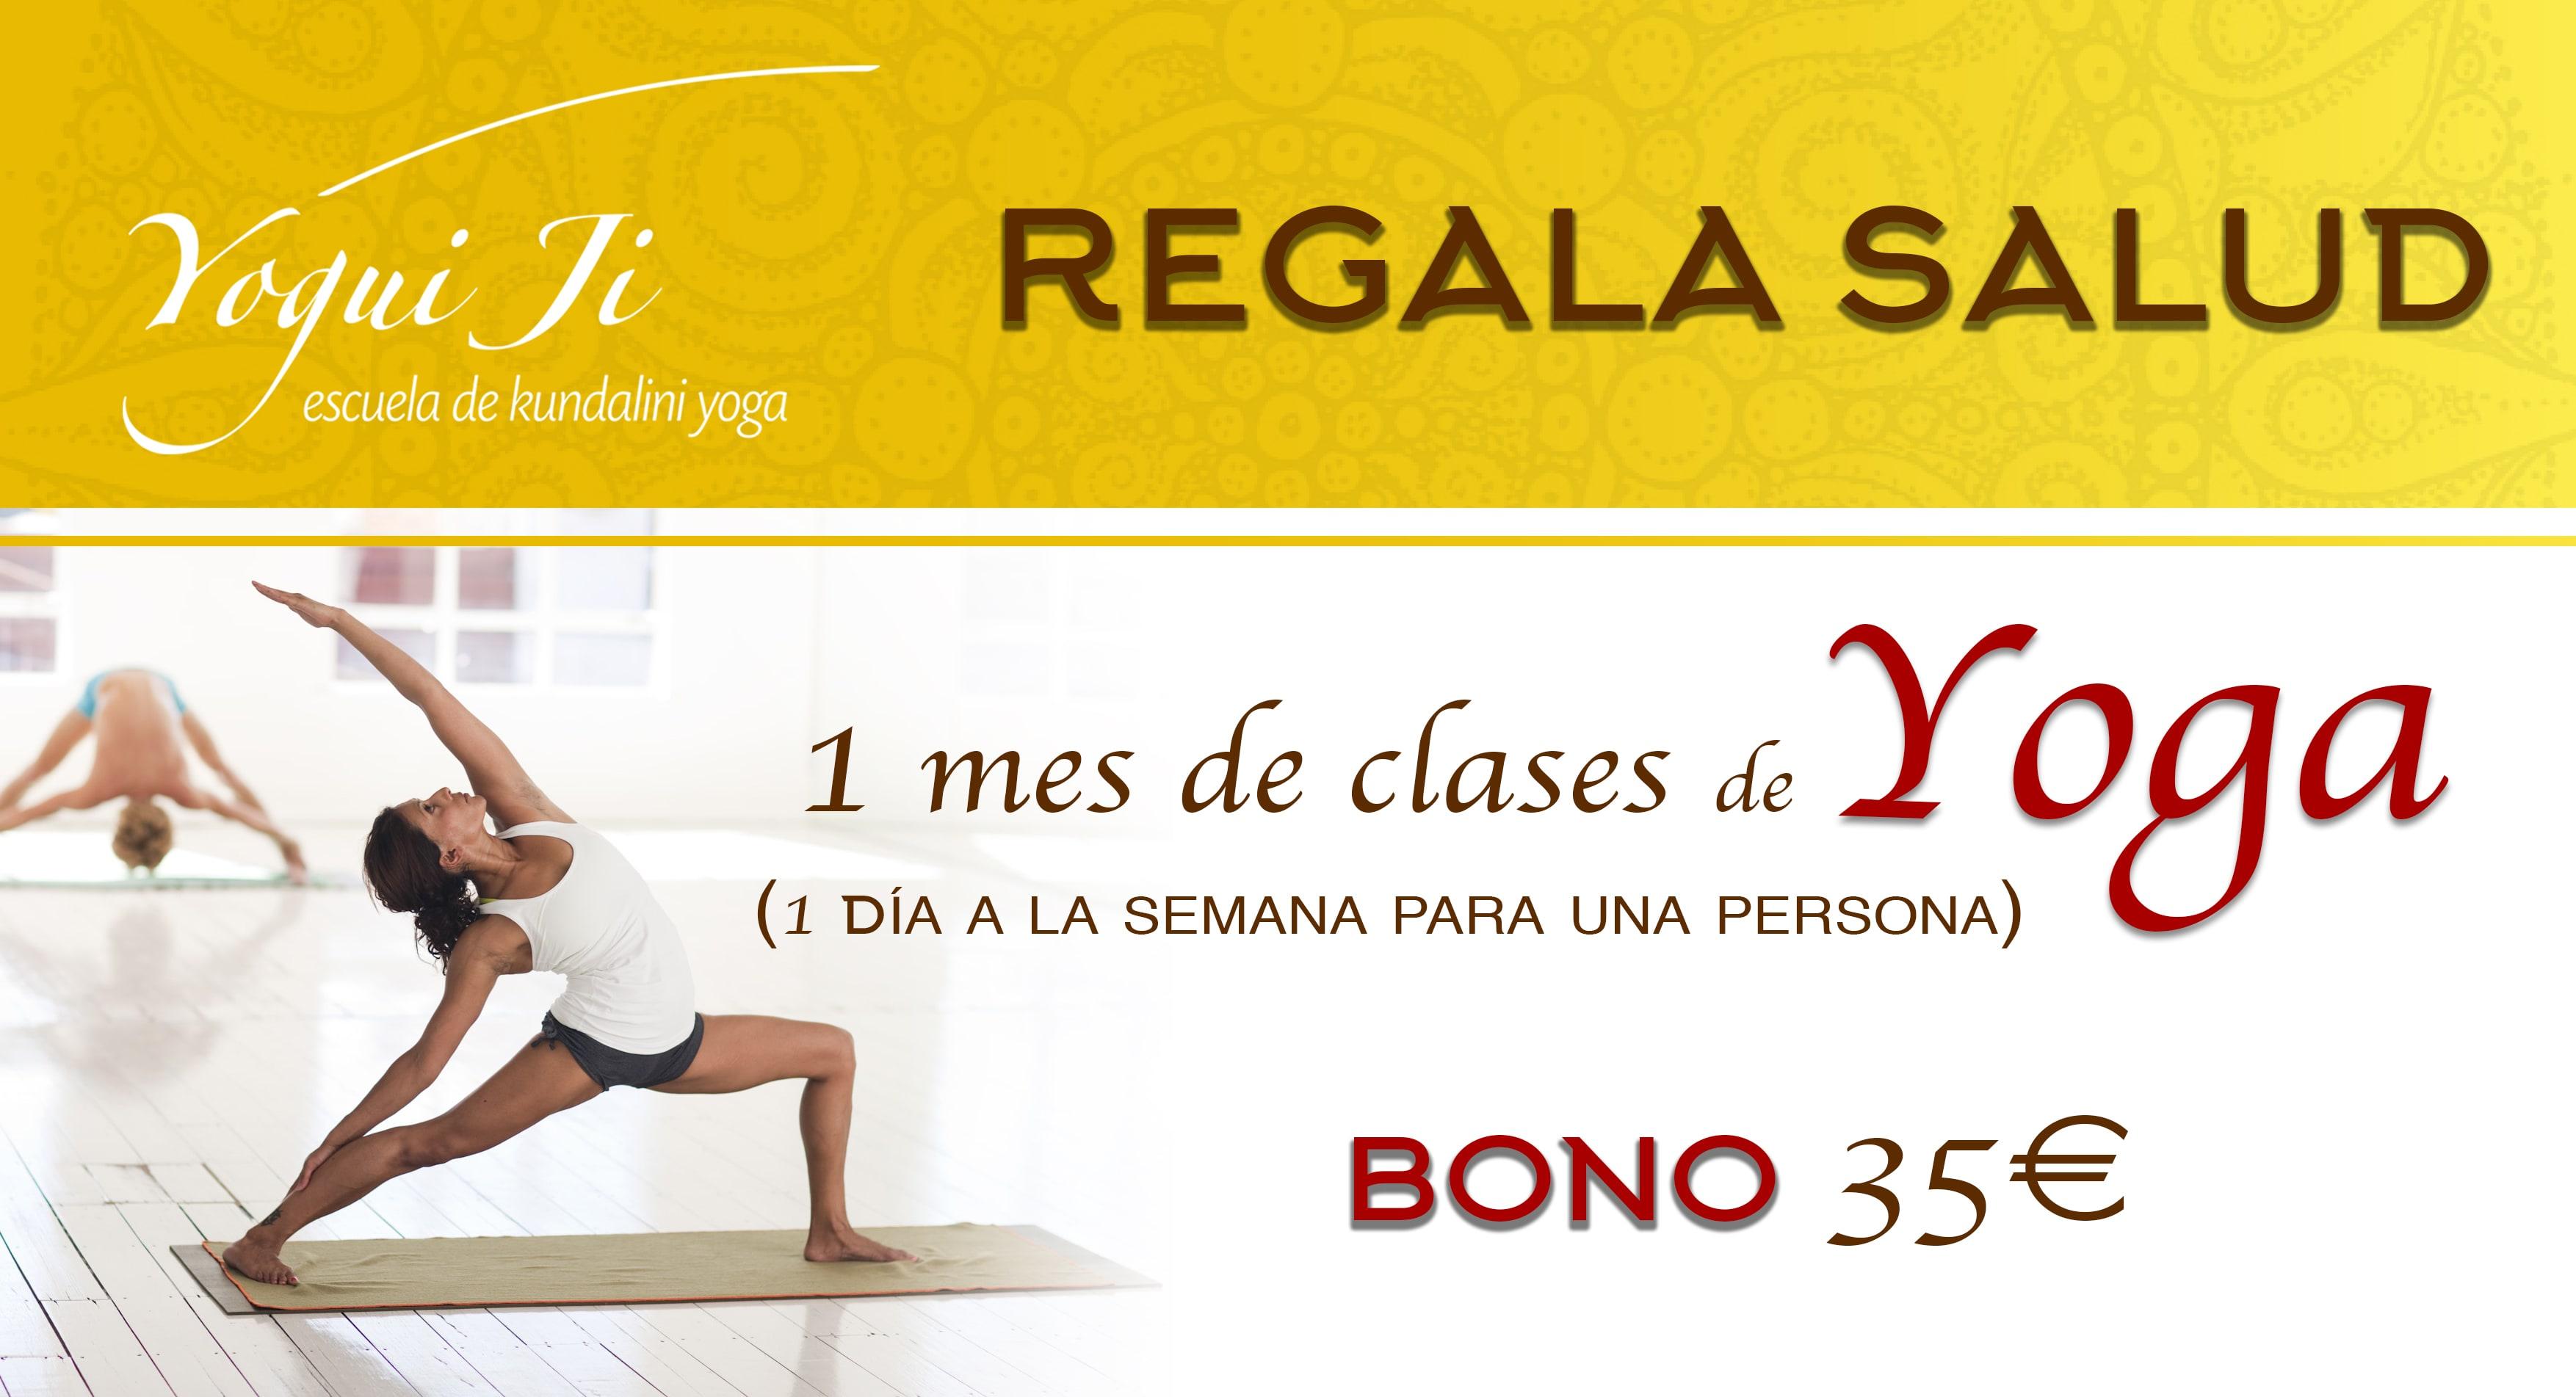 Bono clases de yoga